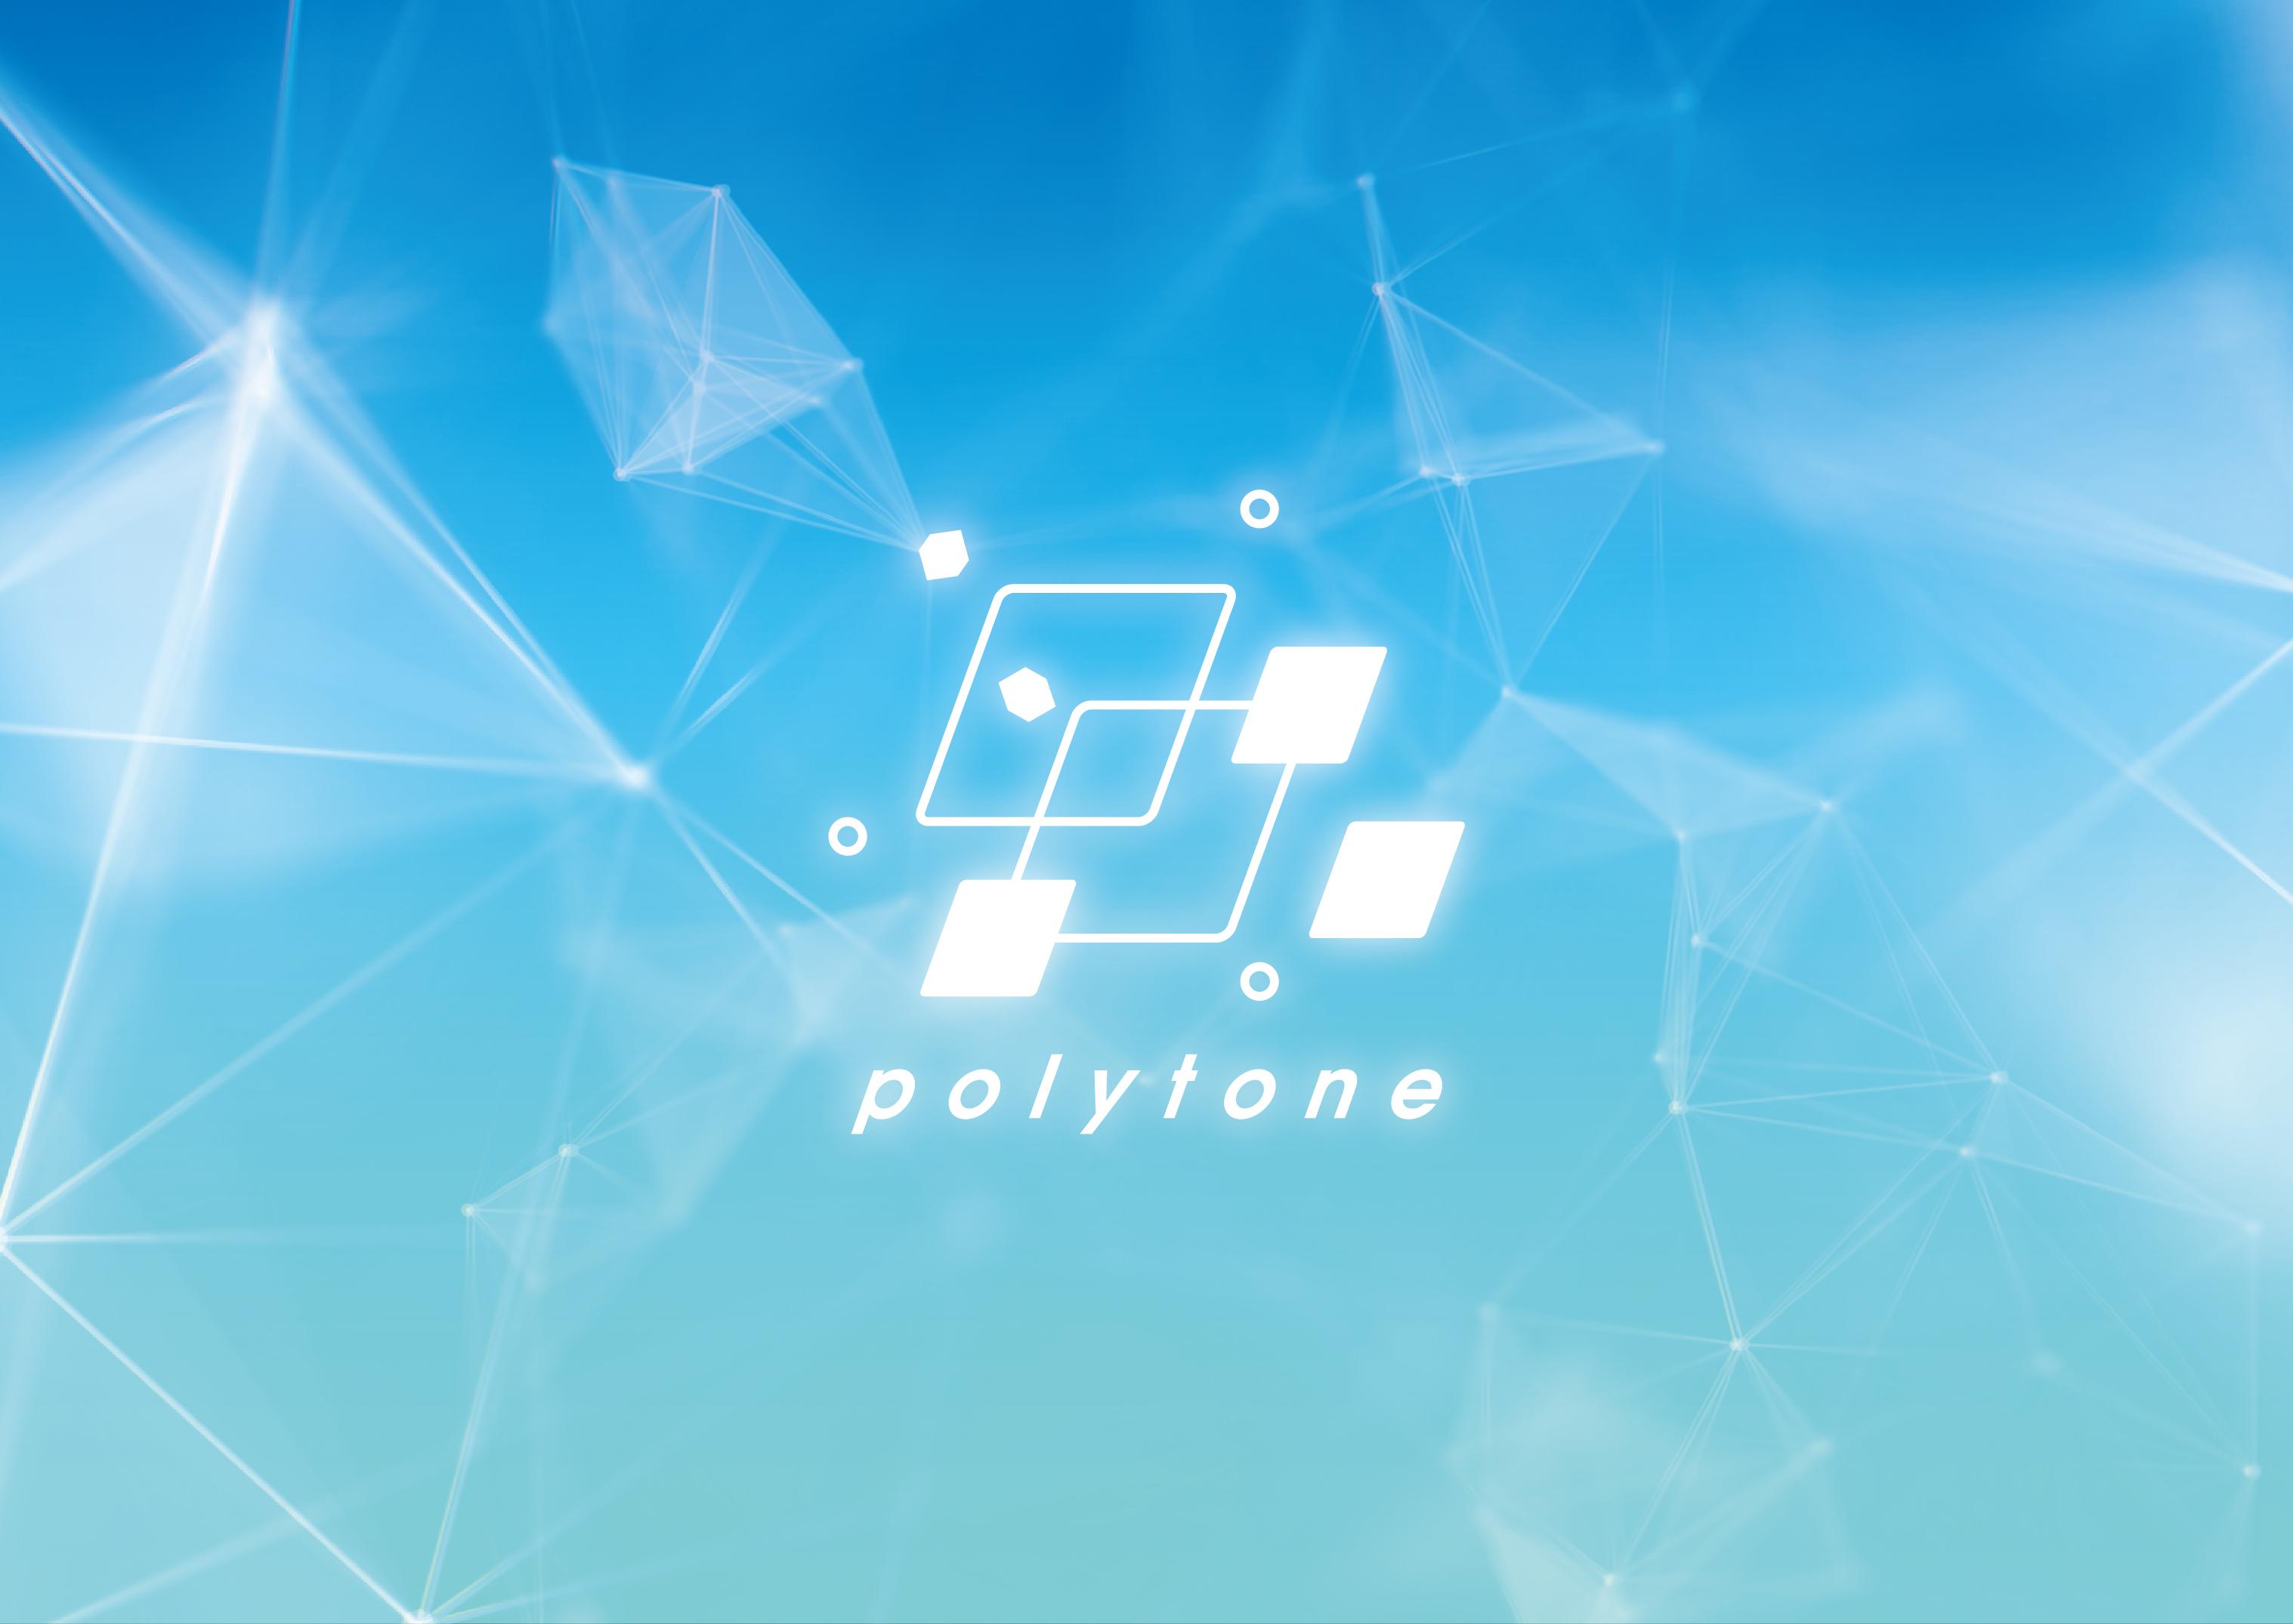 polytone_2